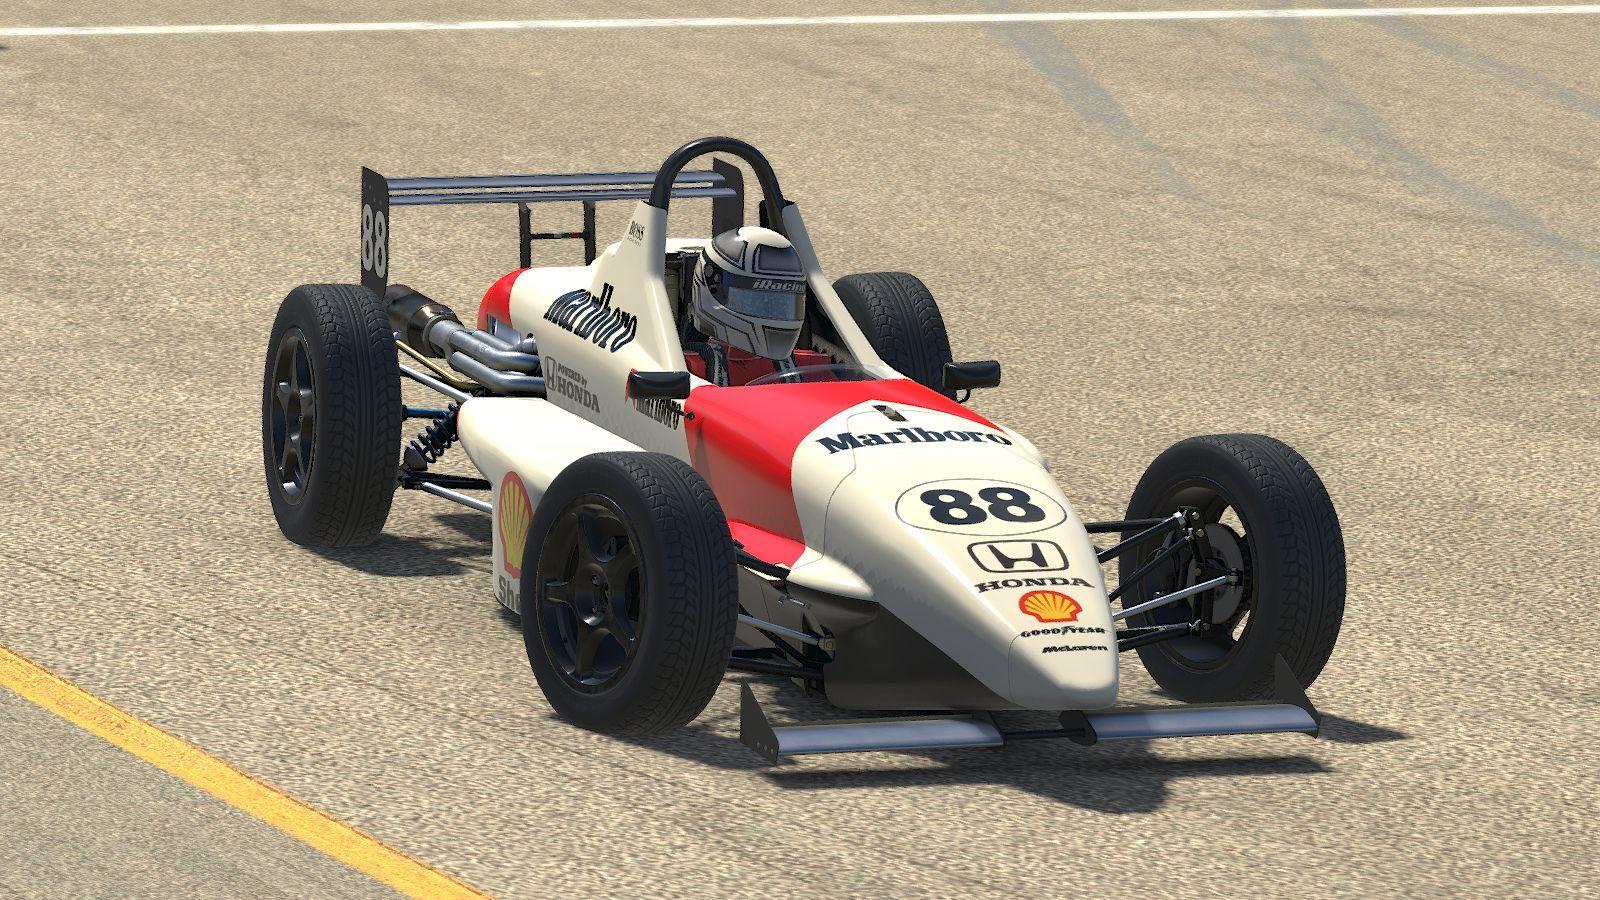 Preview of 1990 Mclaren Formula Skip Barber by Stephane Parent